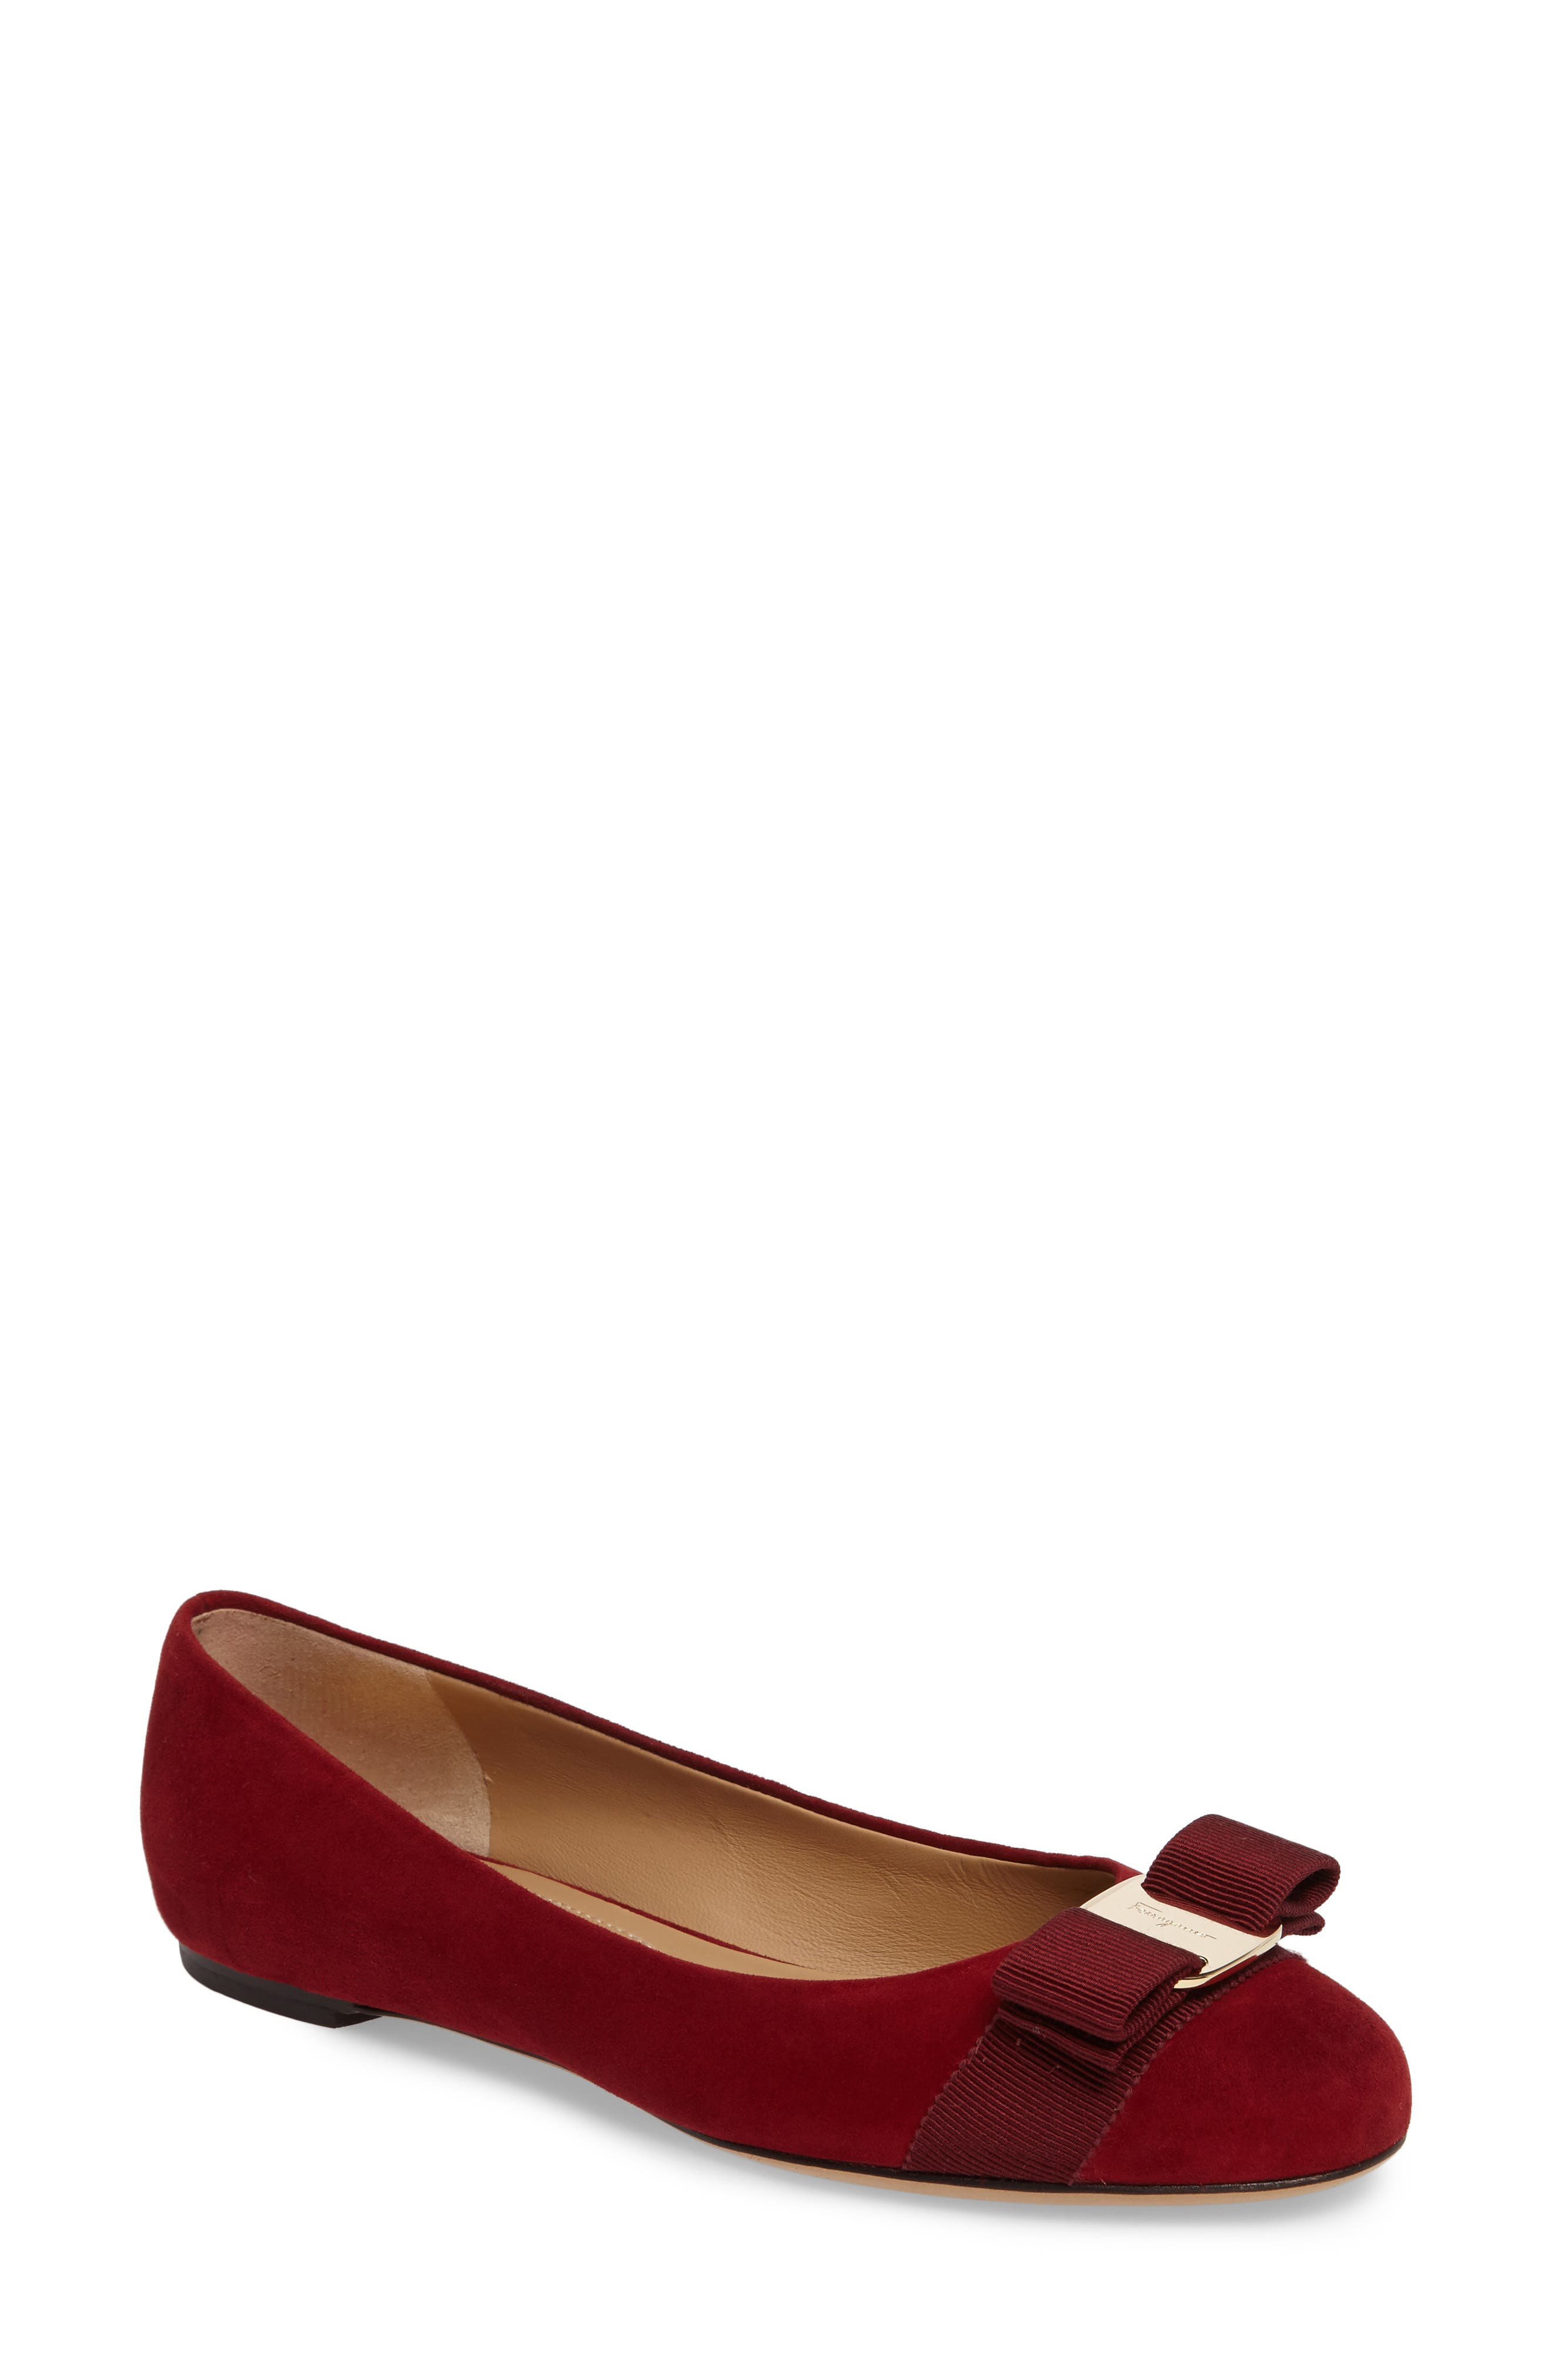 Alternate Image 1 Selected - Salvatore Ferragamo 'Varina' Leather Flat (Women)